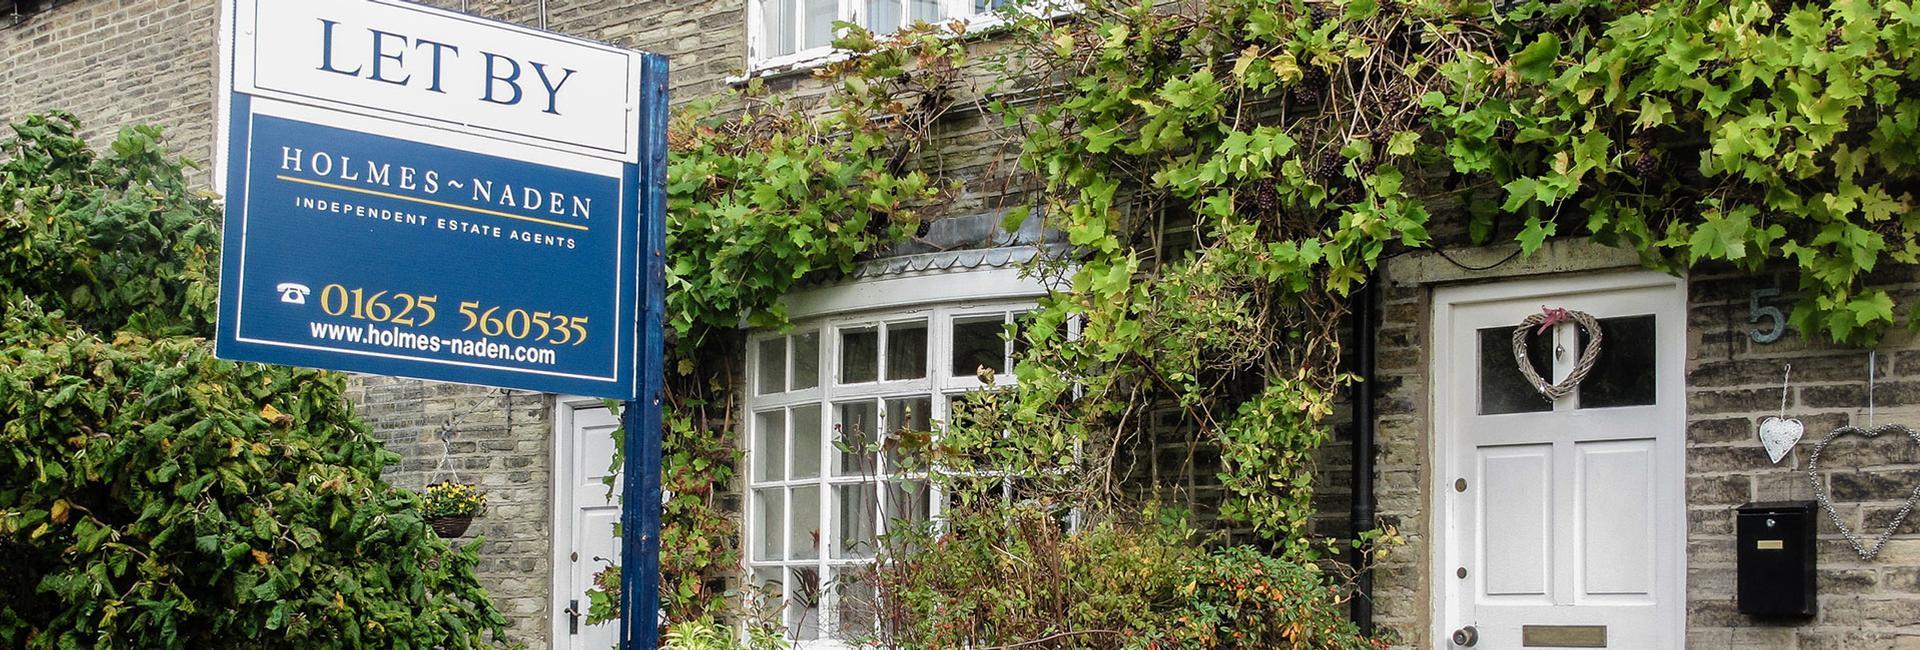 Holmes Naden estate agency board erected outside a cottage - Property Activity Index Report